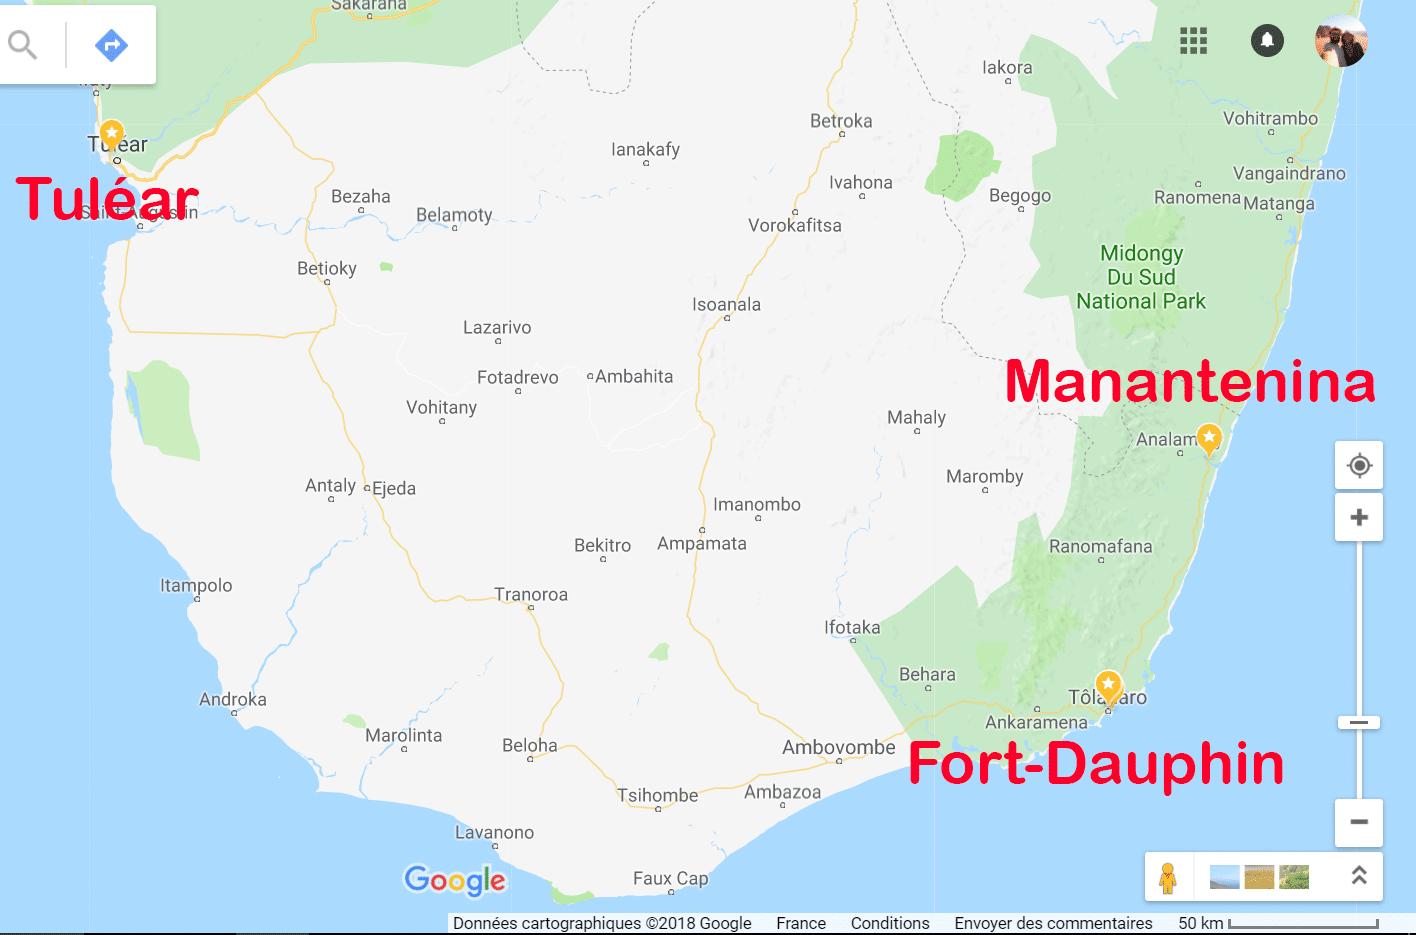 Tuléar Fort-Dauphin Madagascar